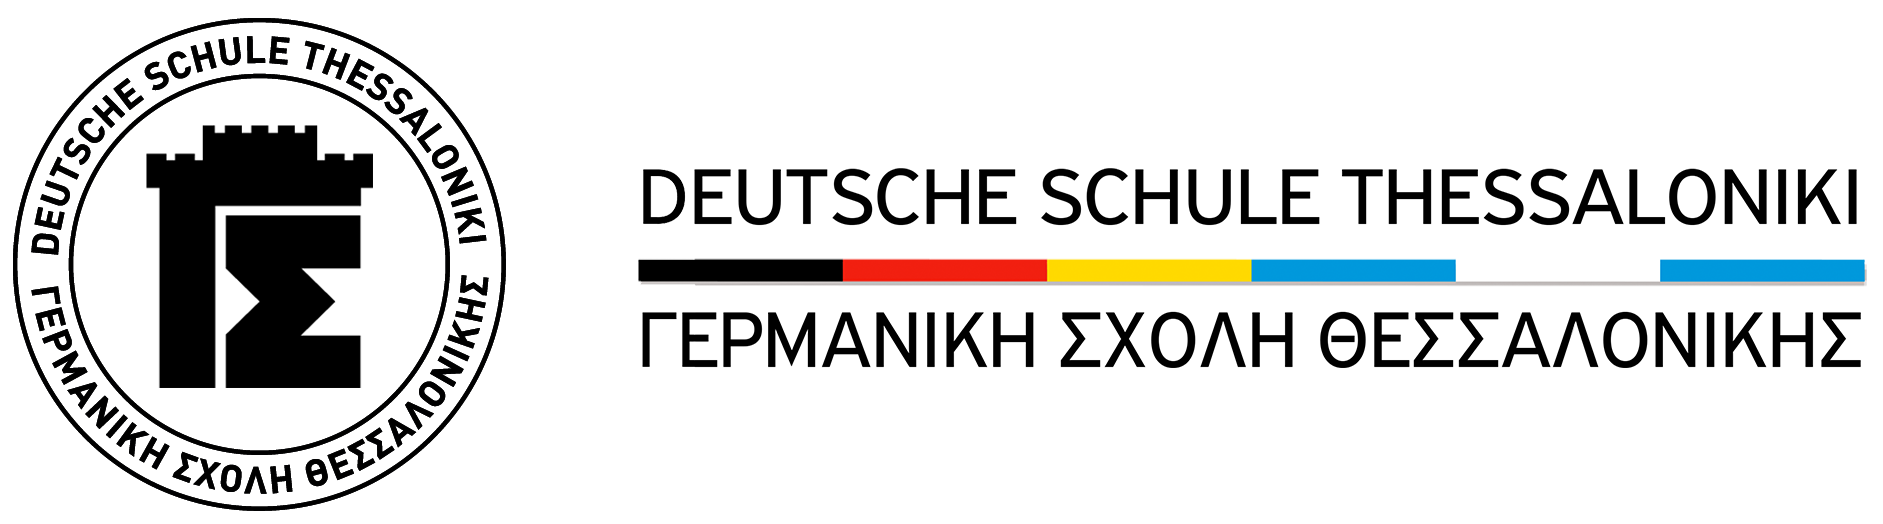 Deutsche Schule Thessaloniki - Γερμανική Σχολή Θεσσαλονίκης